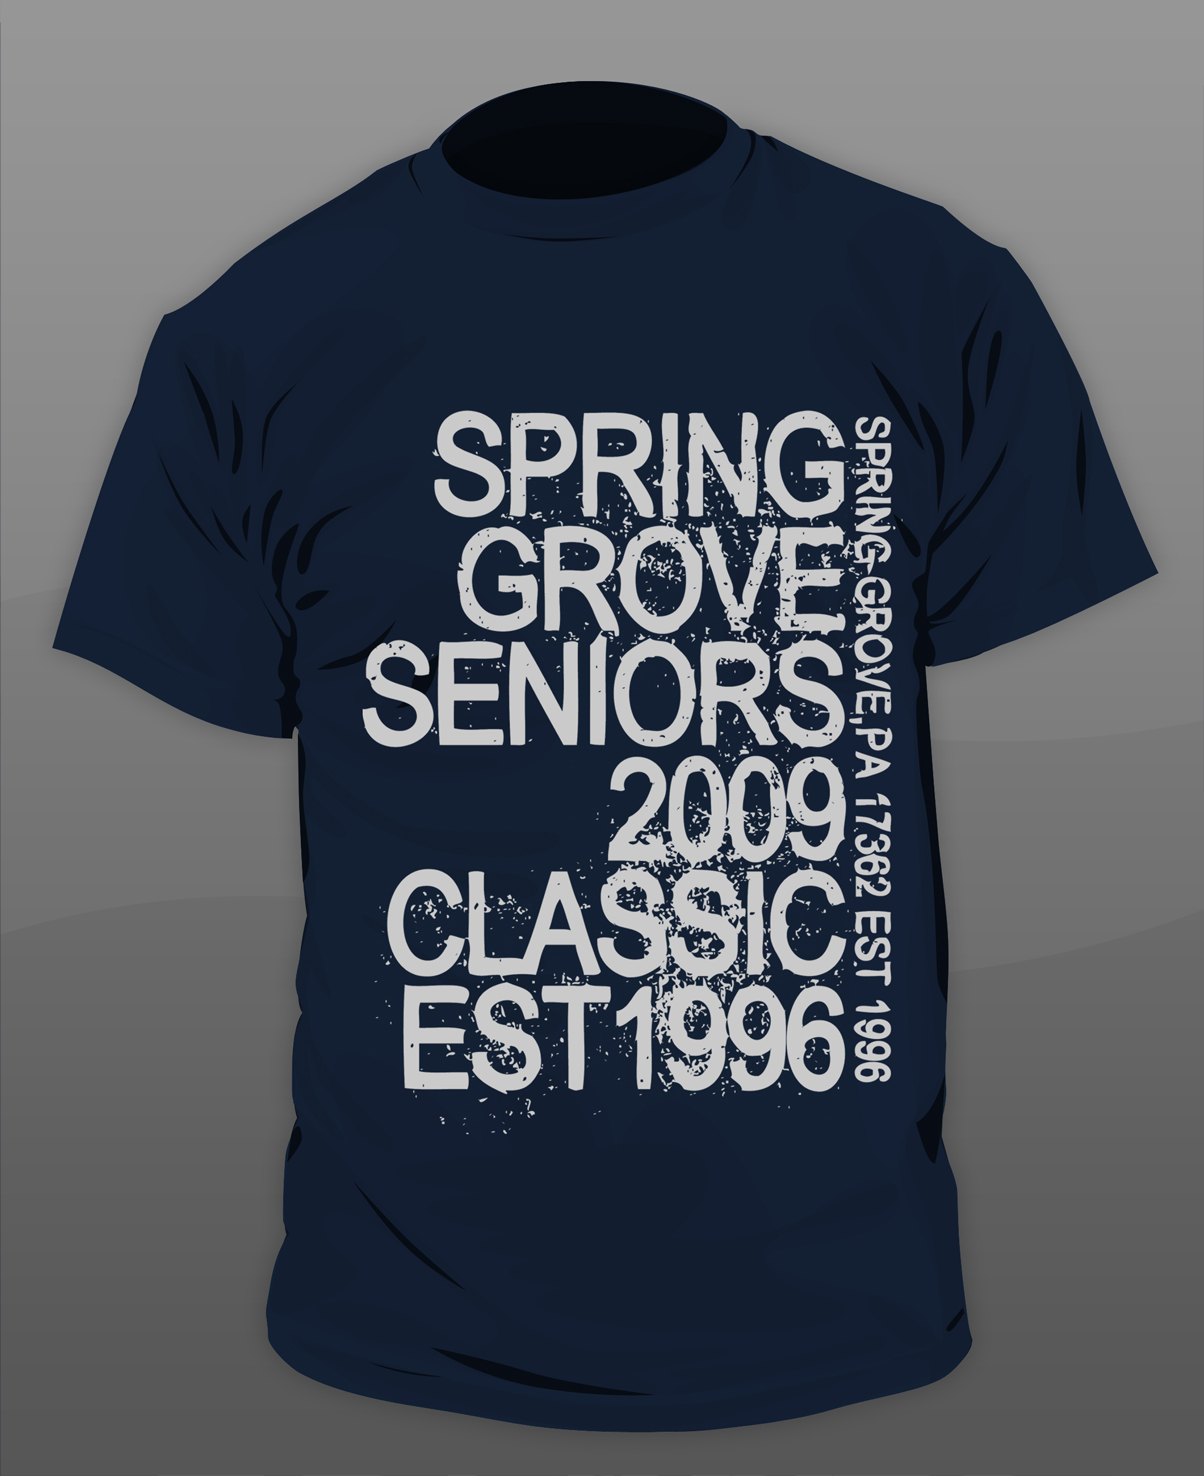 senior class tshirt design by gkgfx on deviantart